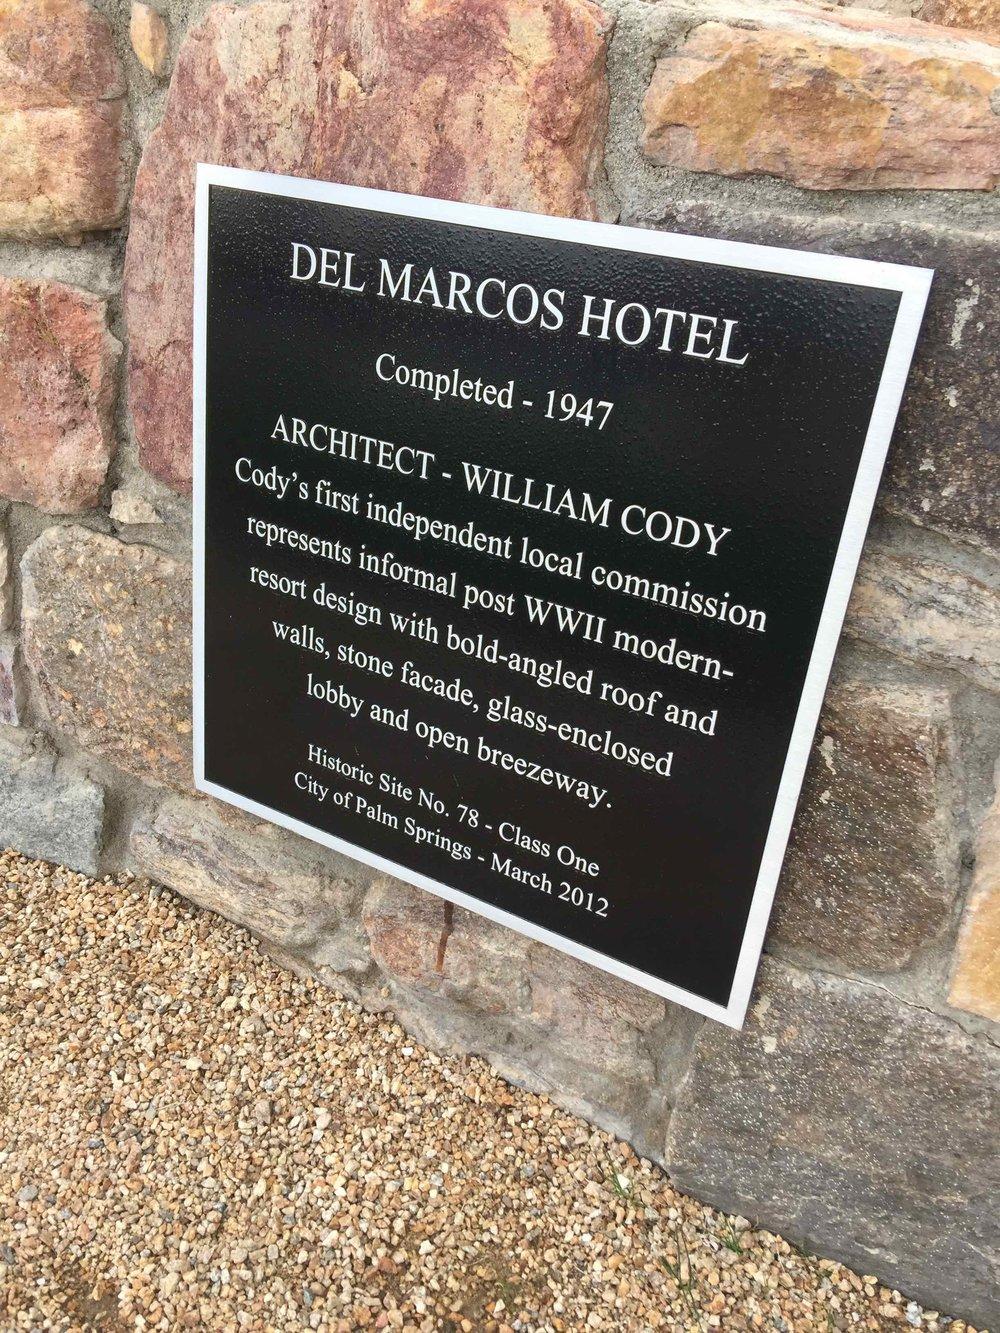 Del Marcos Hotel - historic site plaque